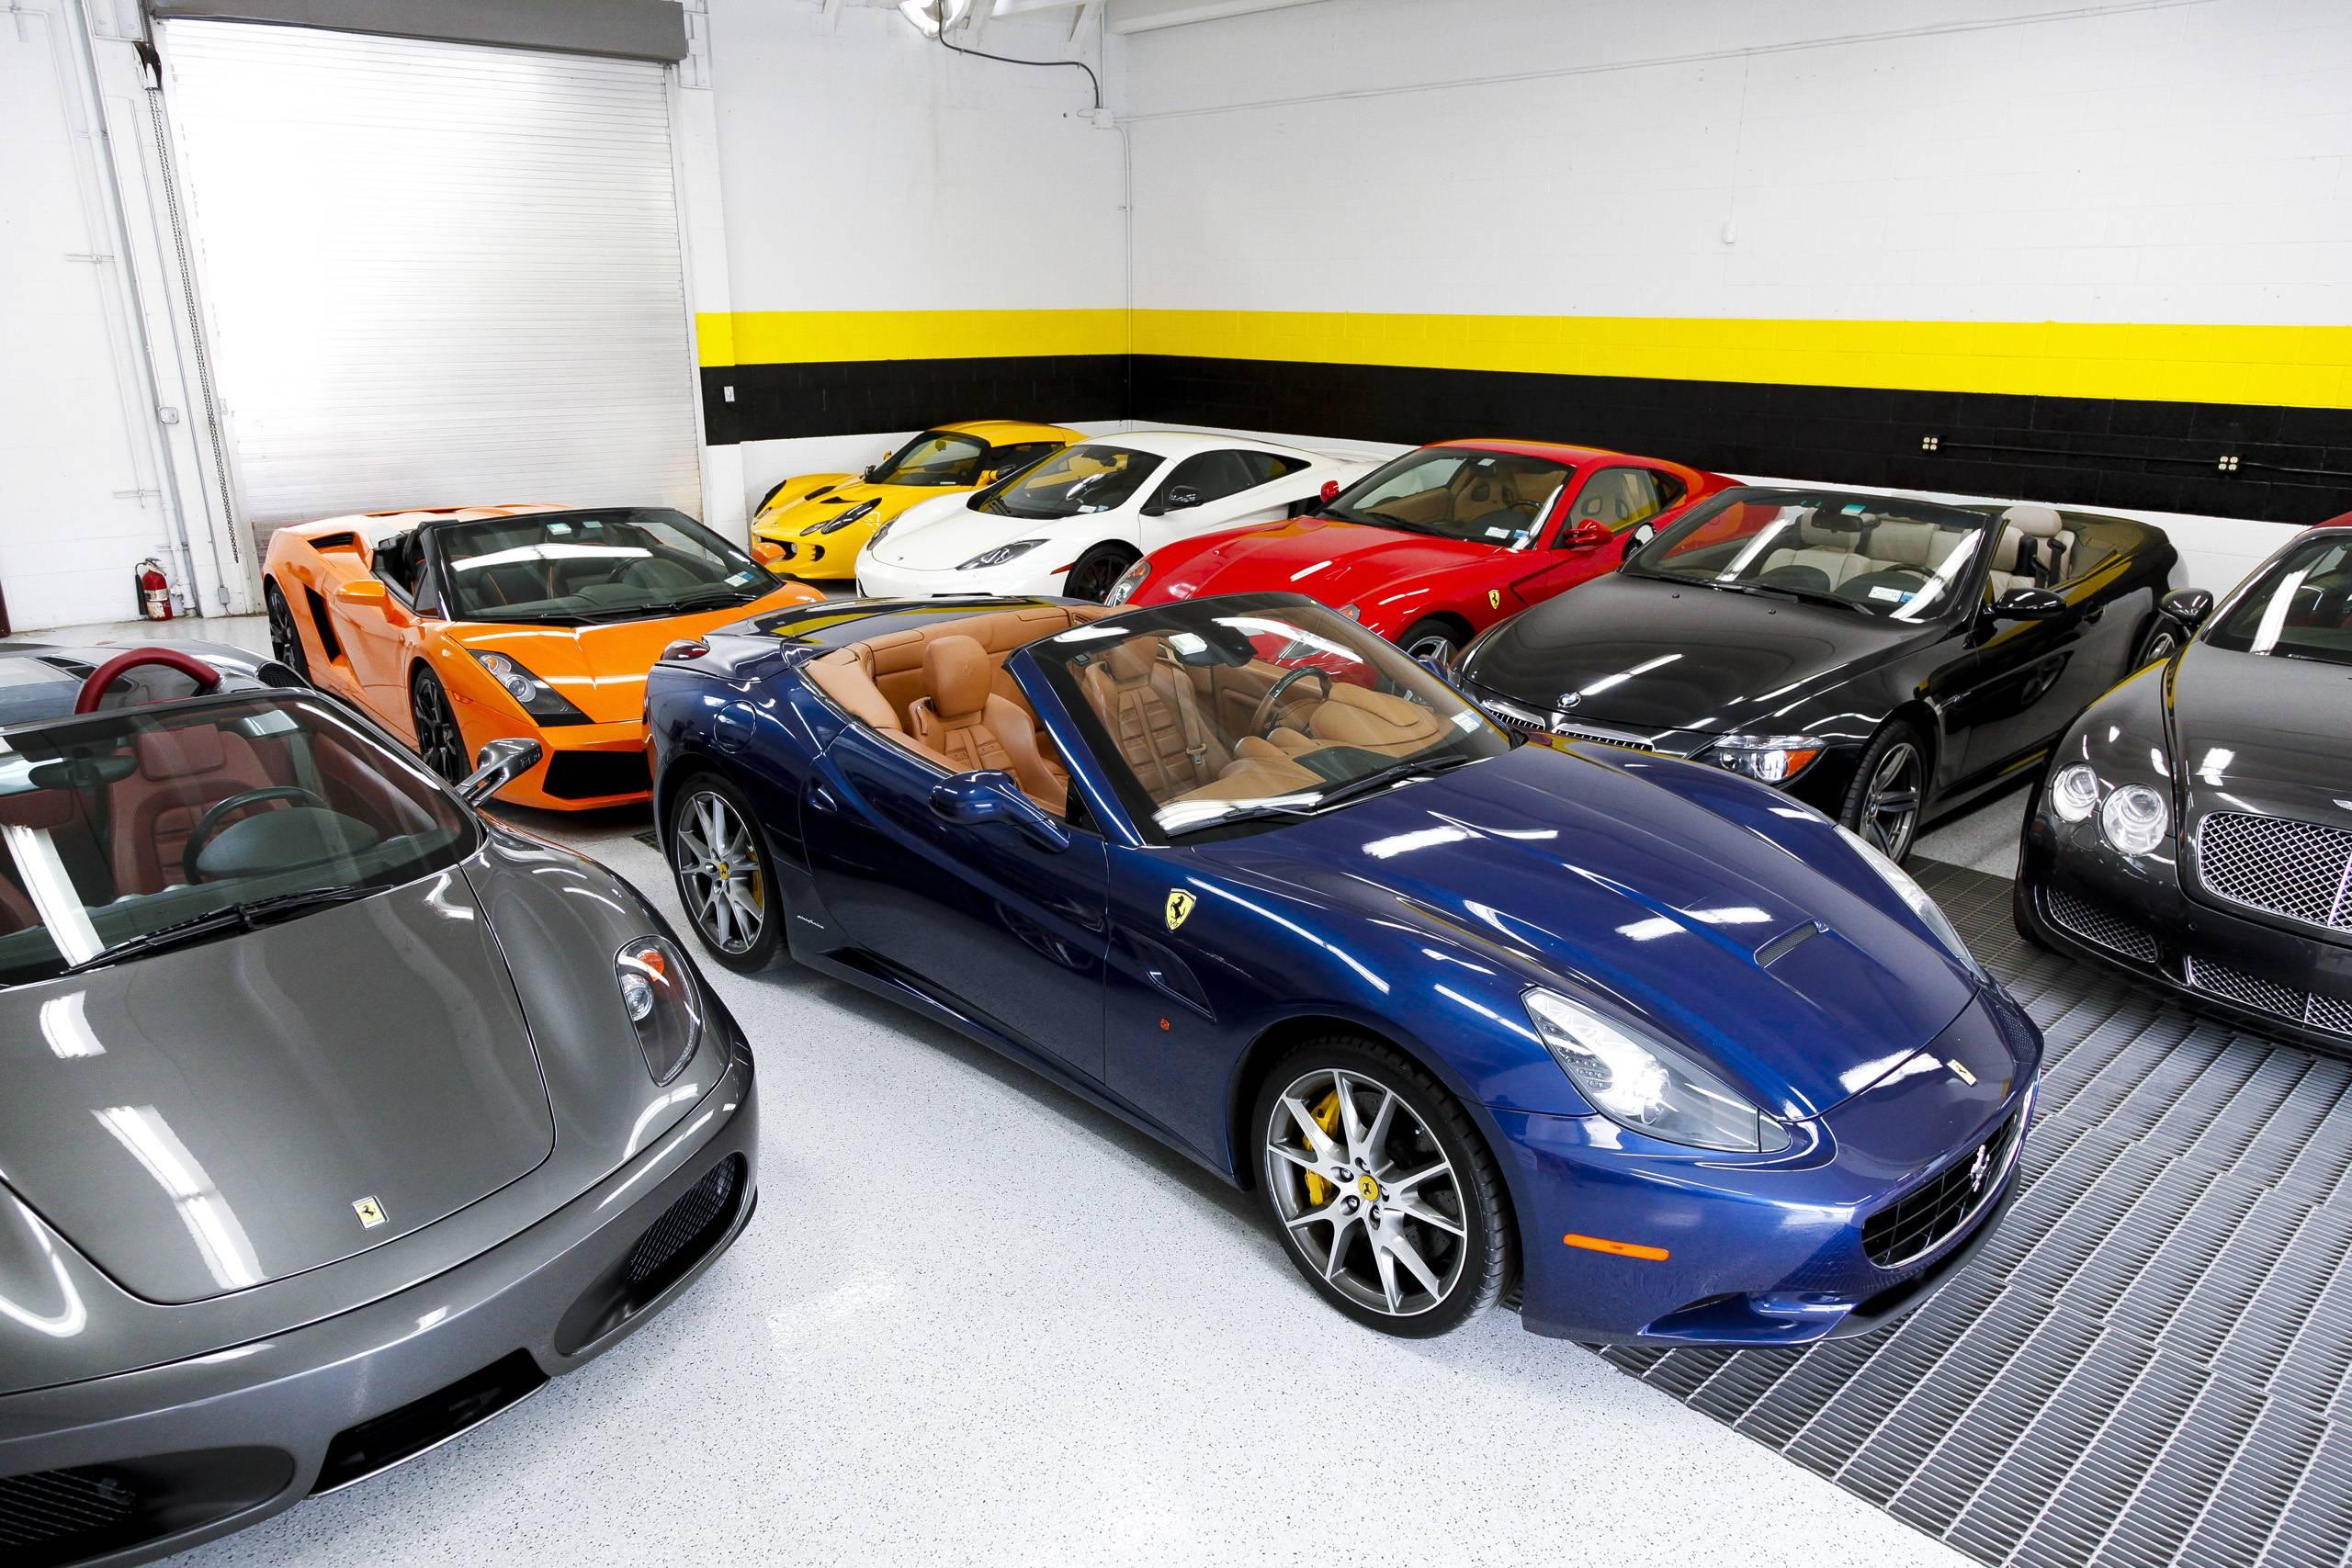 Luxury Car Rentals Gotham Dream Cars Opens Los Angeles Location